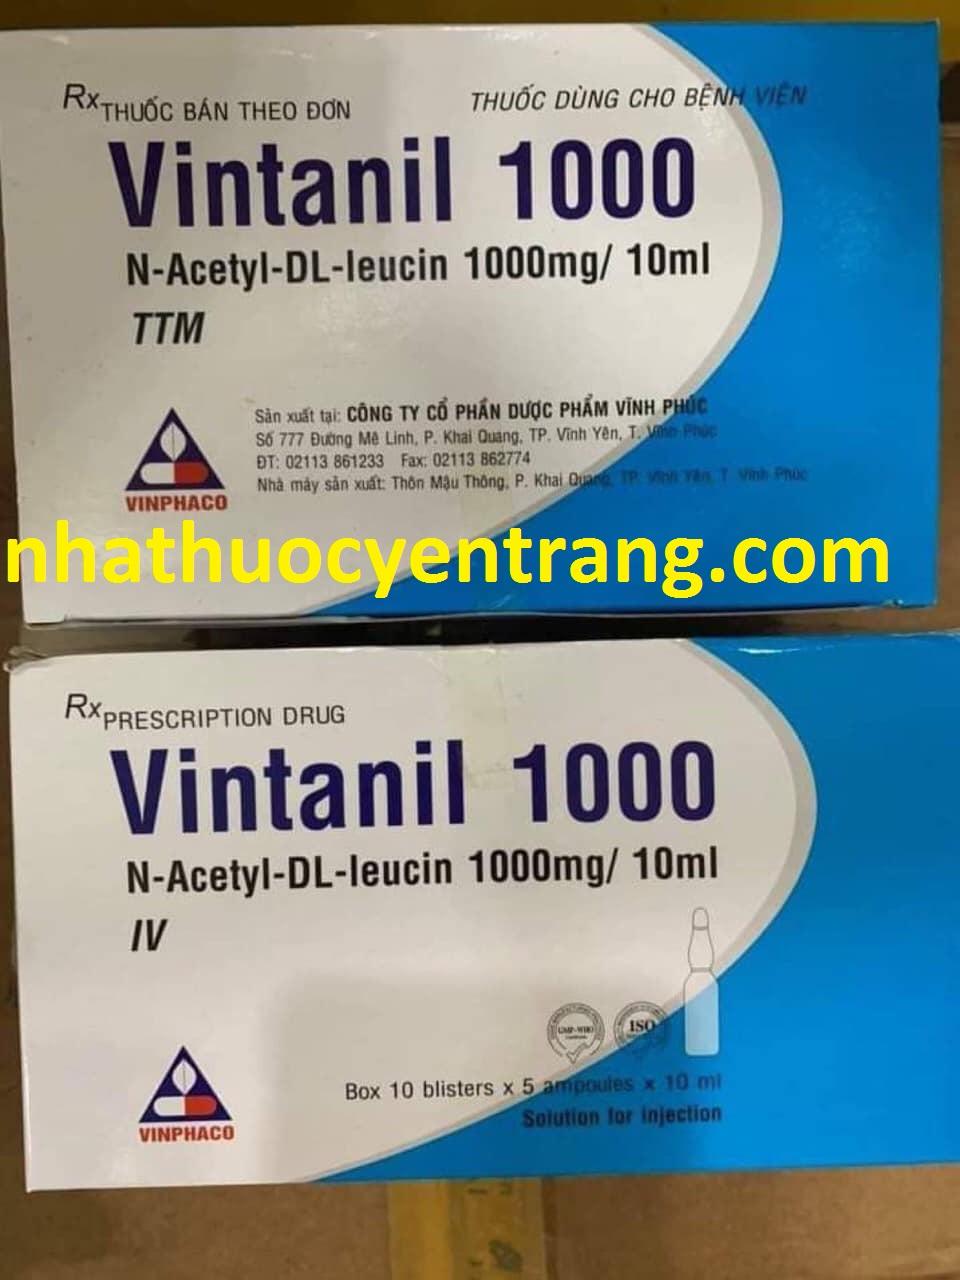 Vintanil 1000mg/10ml